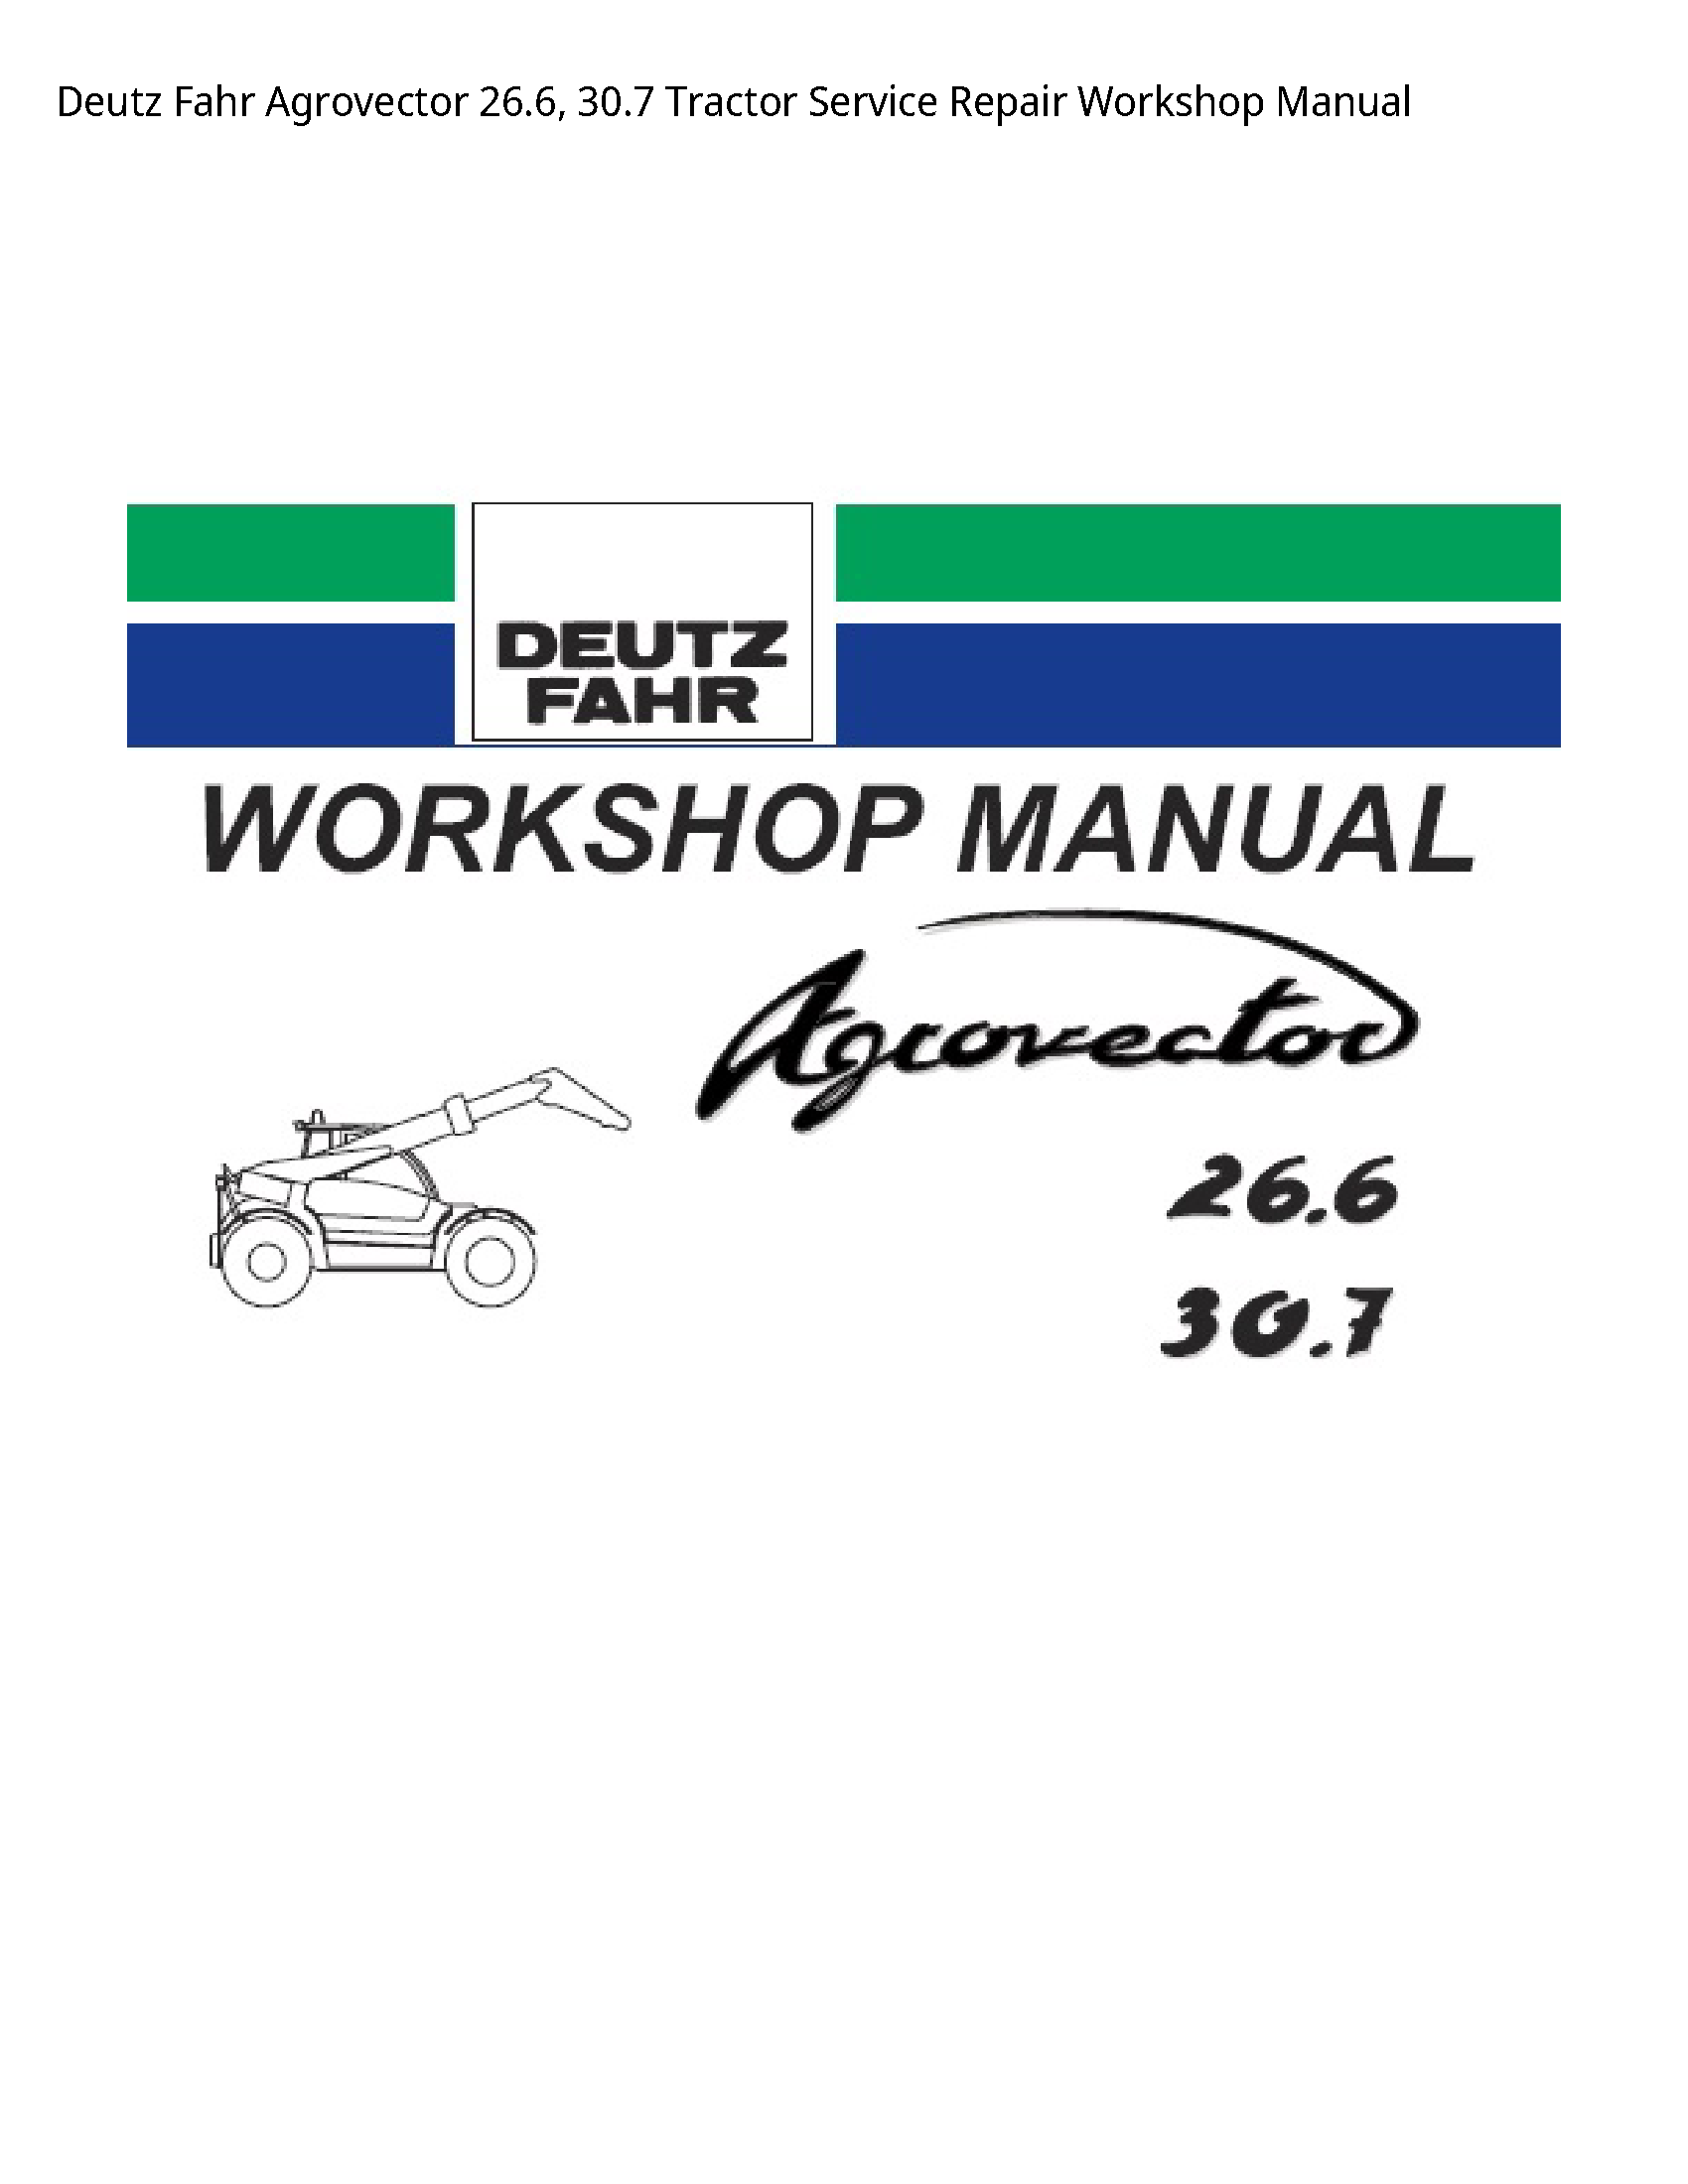 Deutz 26.6 Fahr Agrovector Tractor manual